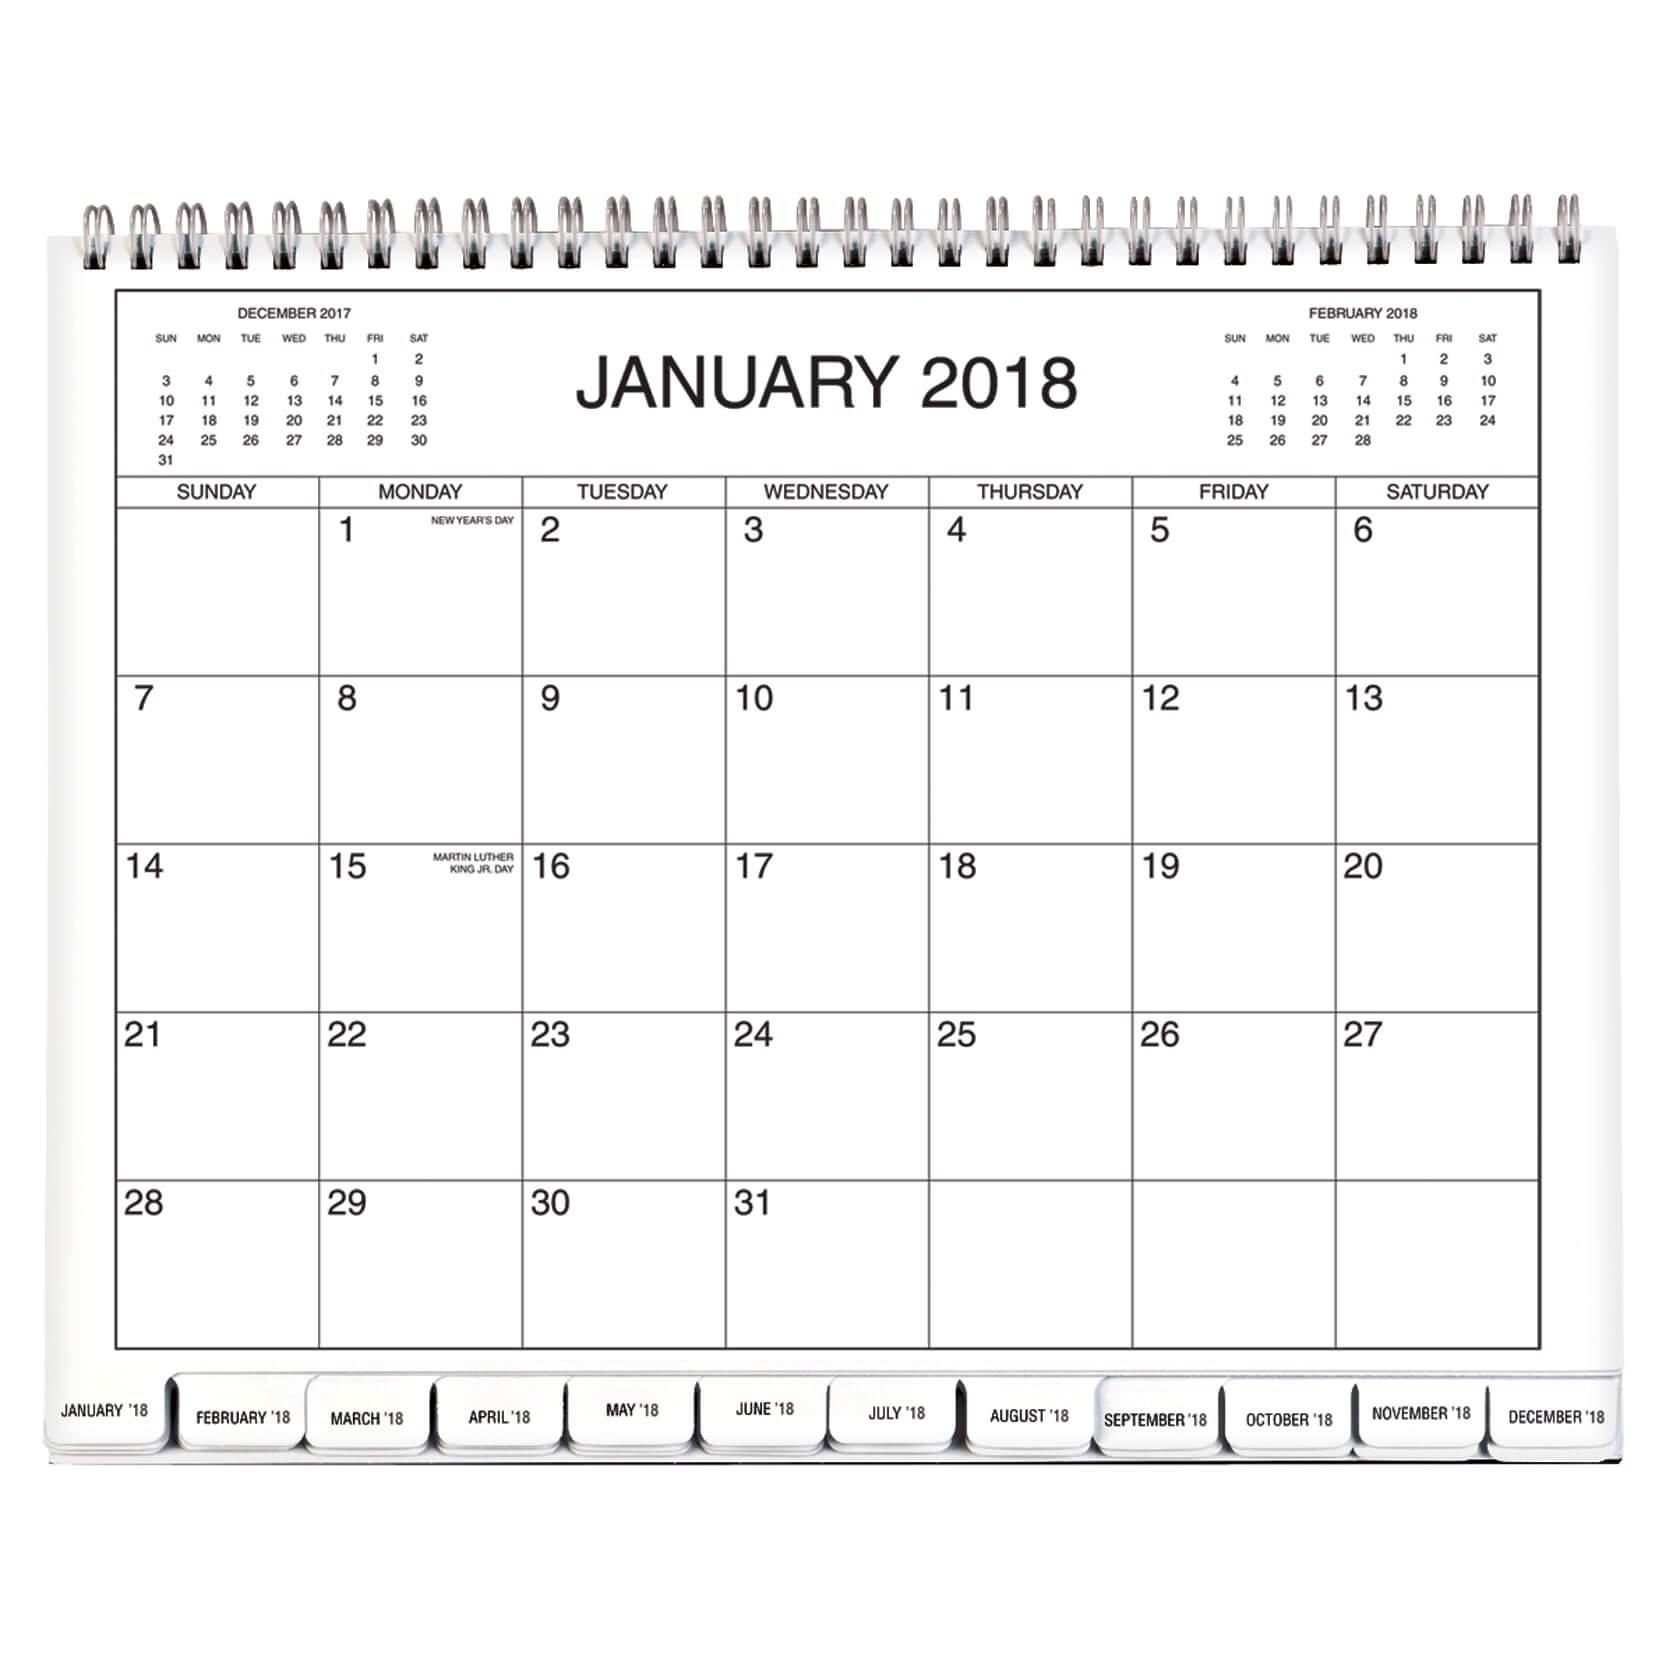 5 Year Calendar 2018-2019-2020-2021-2022 - Monthly Calendar - Walter Calendar 2019 Sale